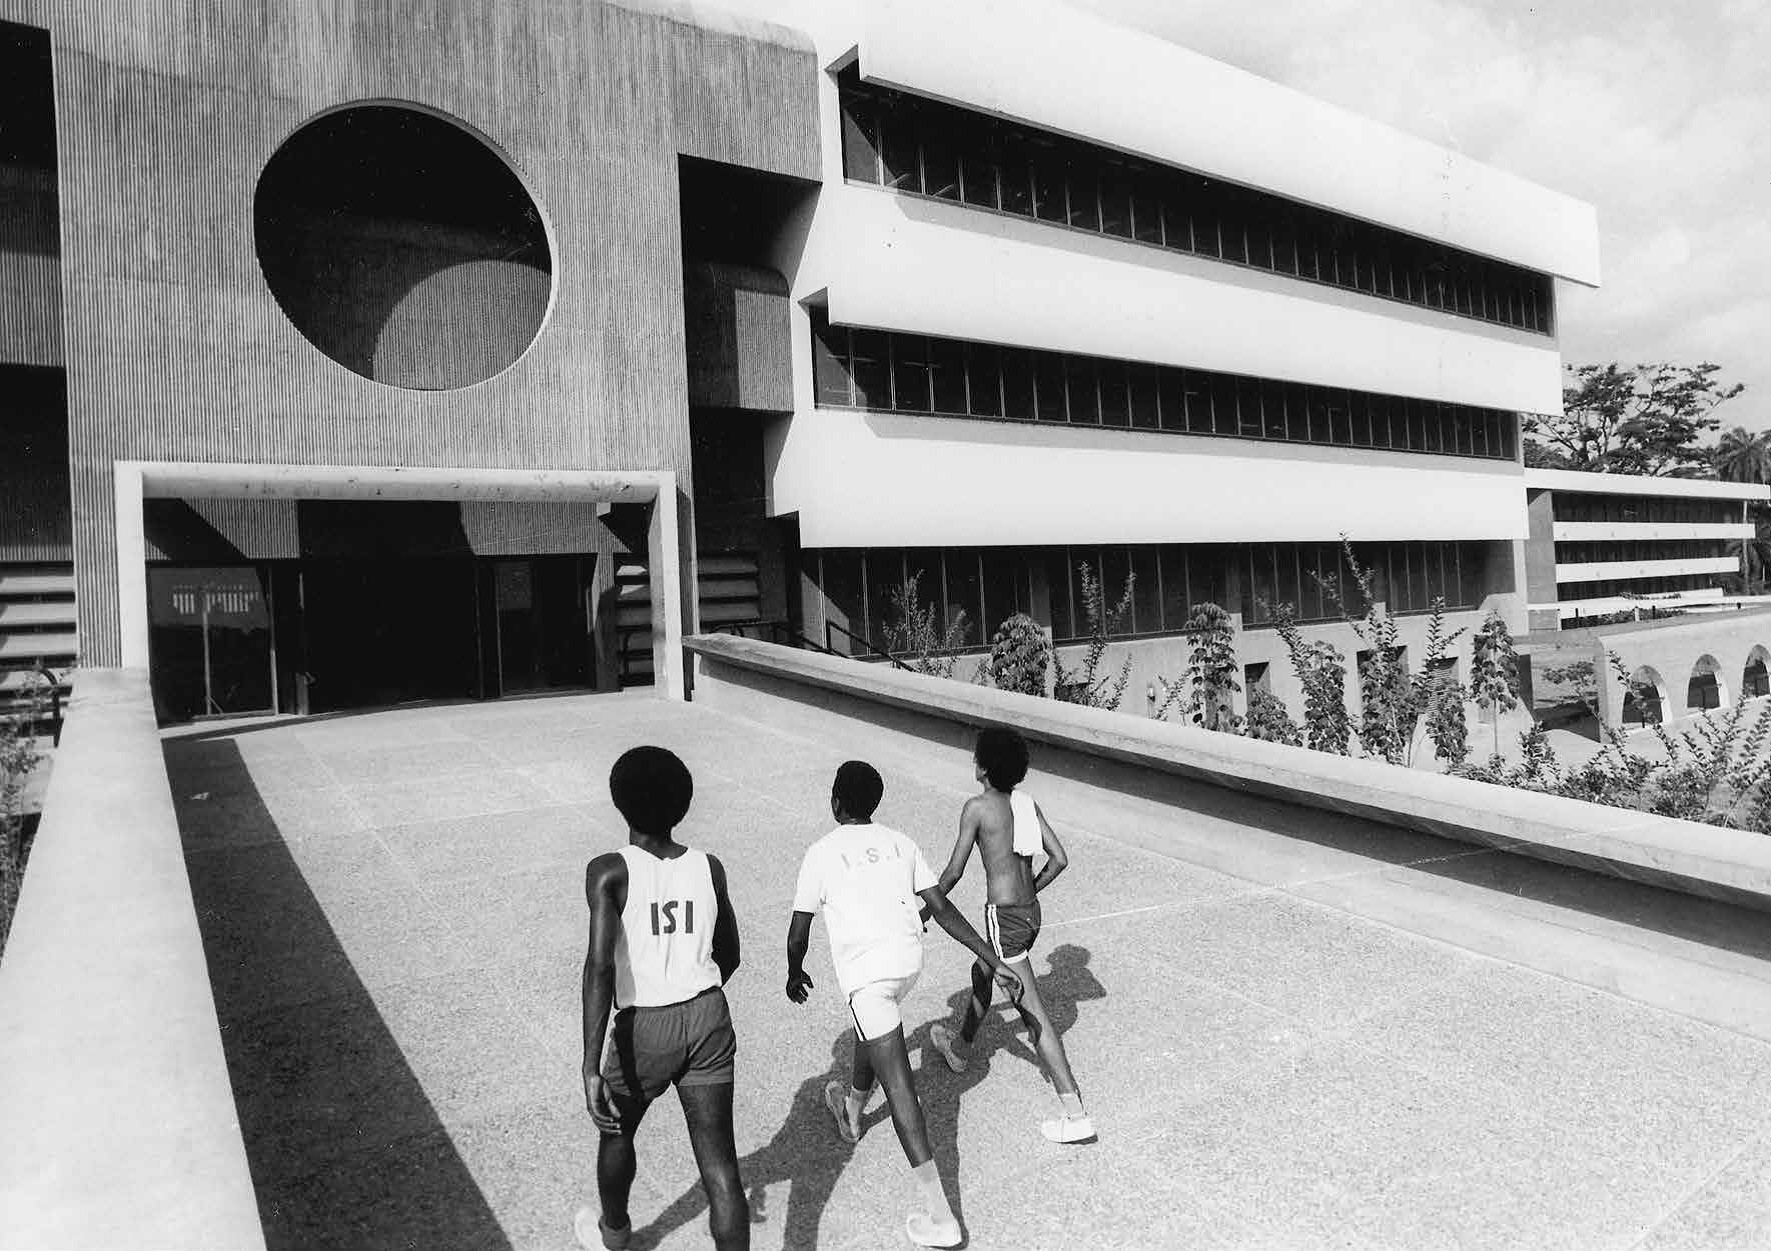 Moving away | Arieh Sharon and Eldar Sharon, University of Ife (Obafemi Awolowo University), Ile-Ife, Osun, Nigeria, late 1960s | Yael Aloni Collection